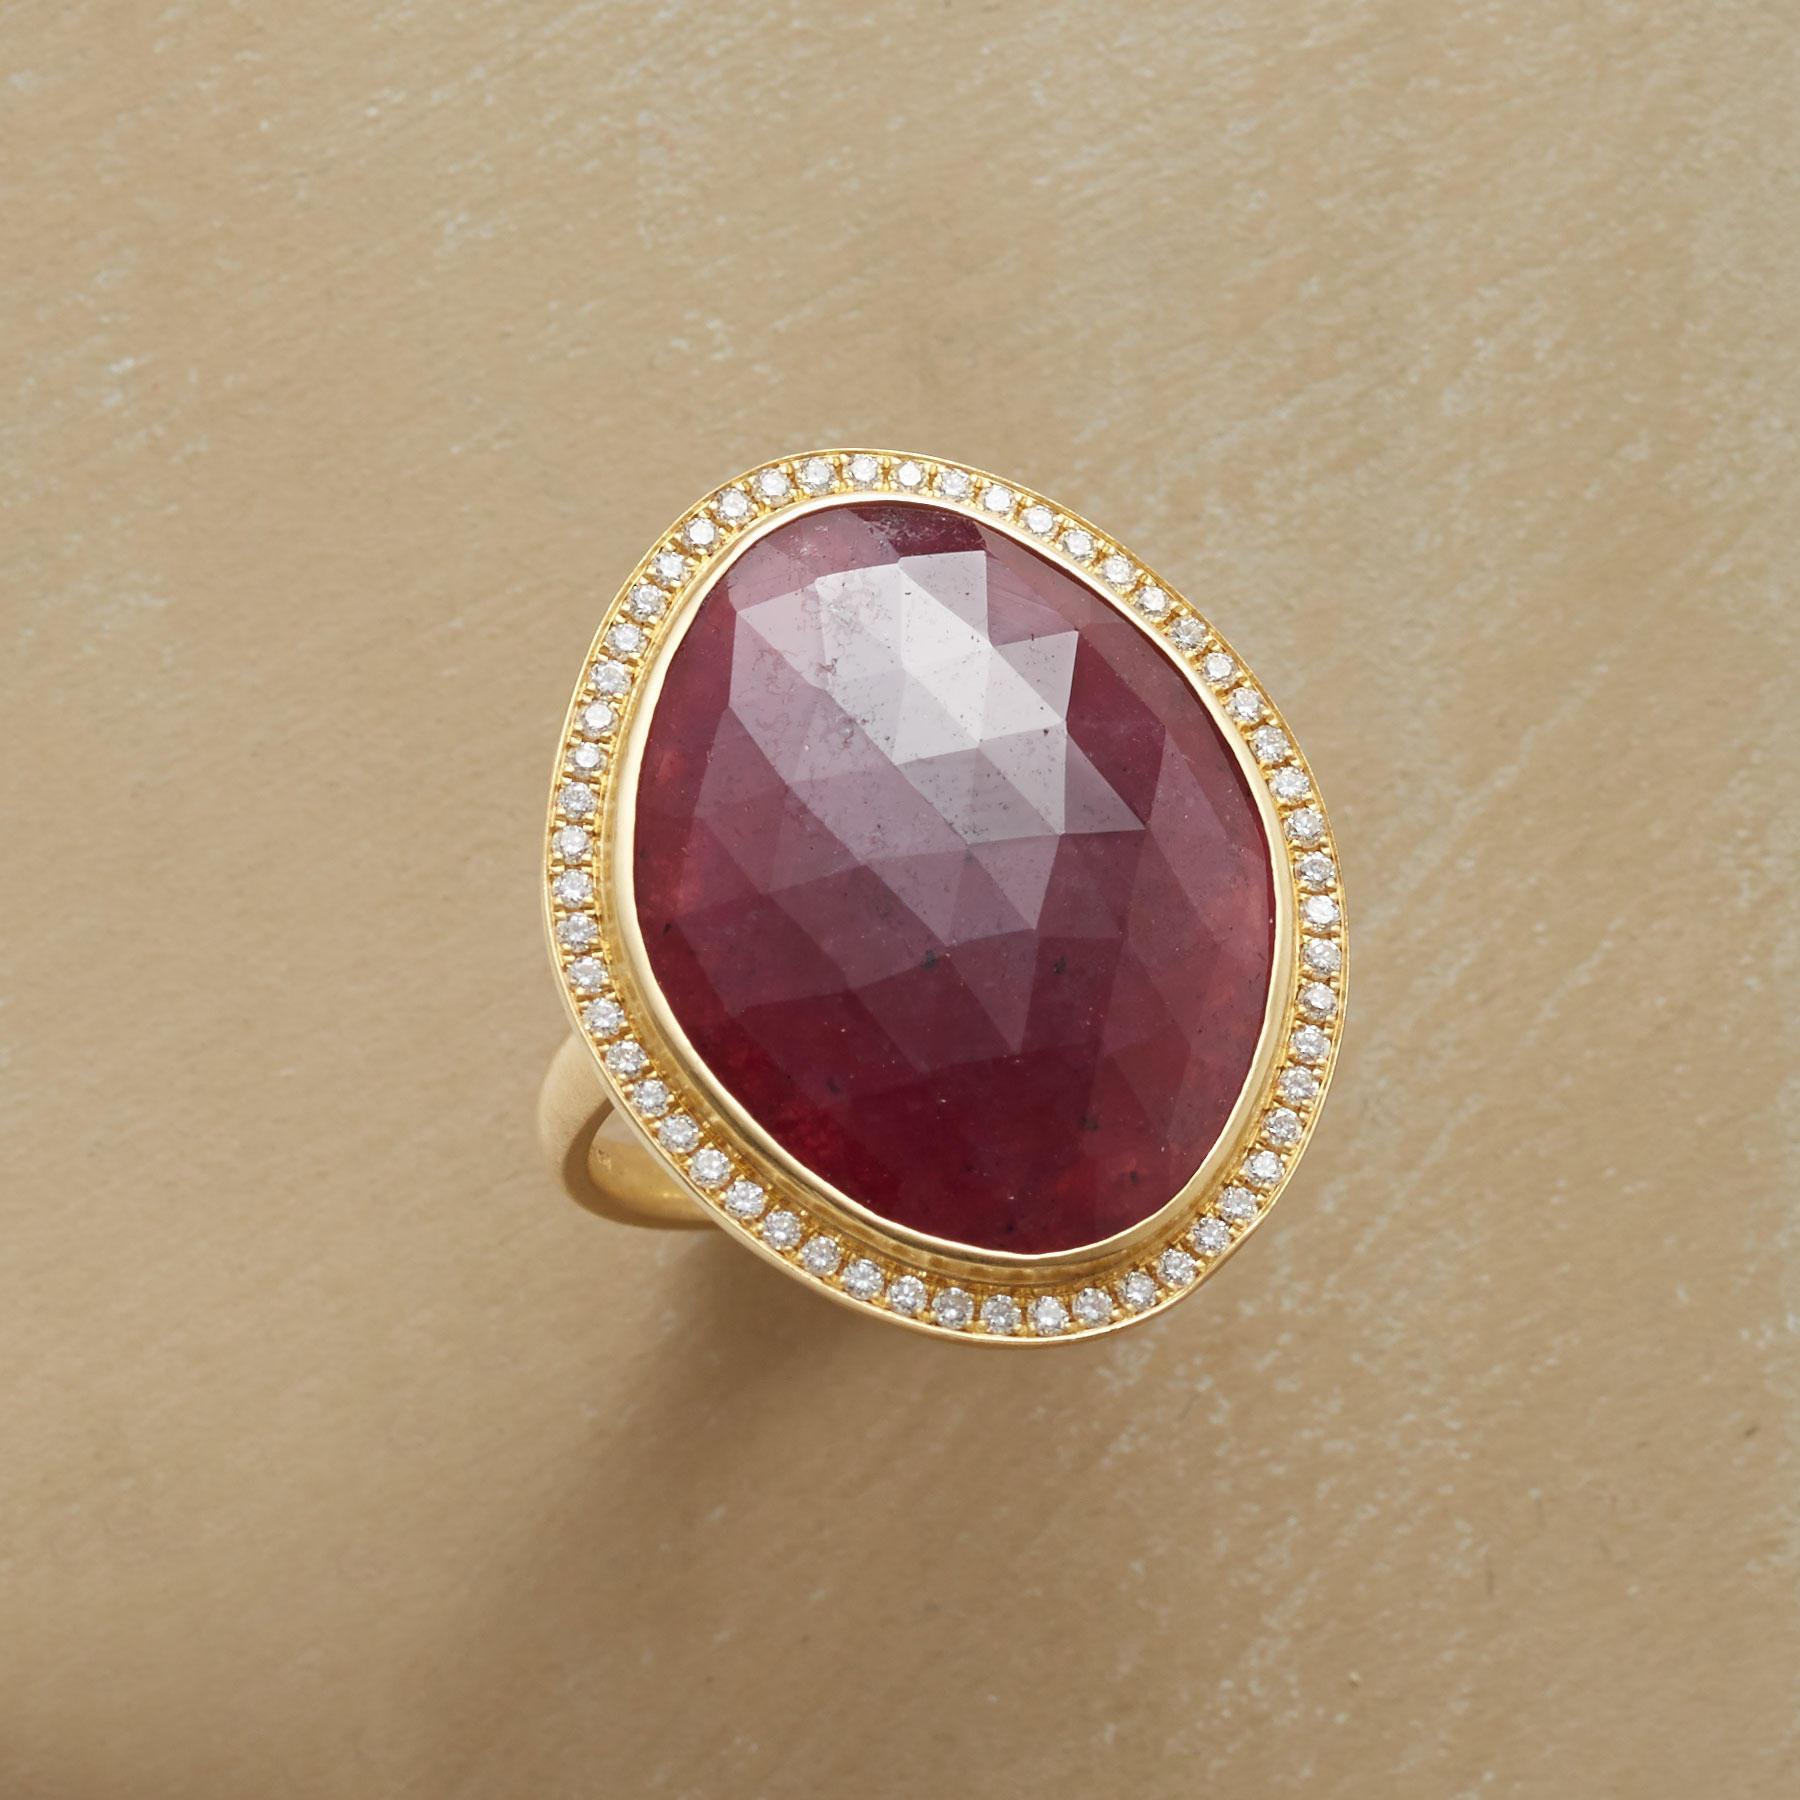 Garland Ruby Ring